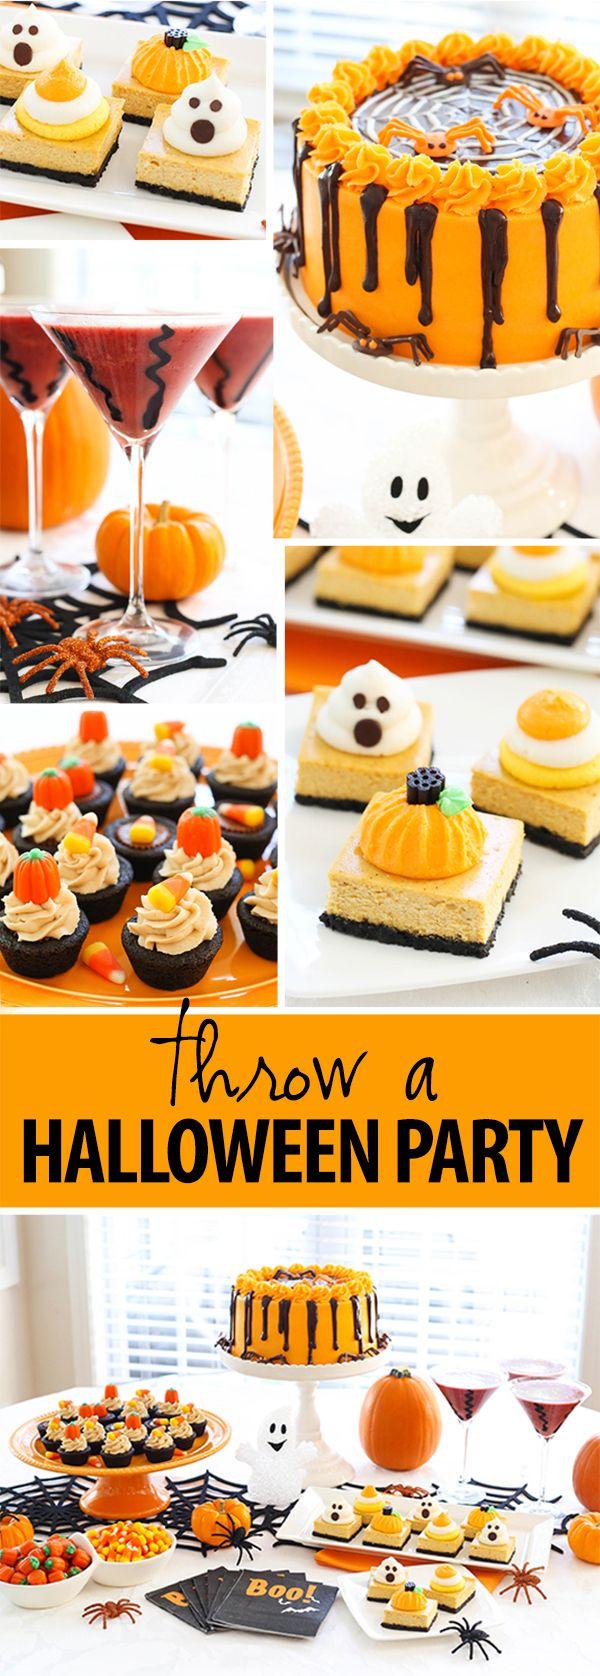 1052 best images about Halloween on Pinterest | Halloween, Spider ...